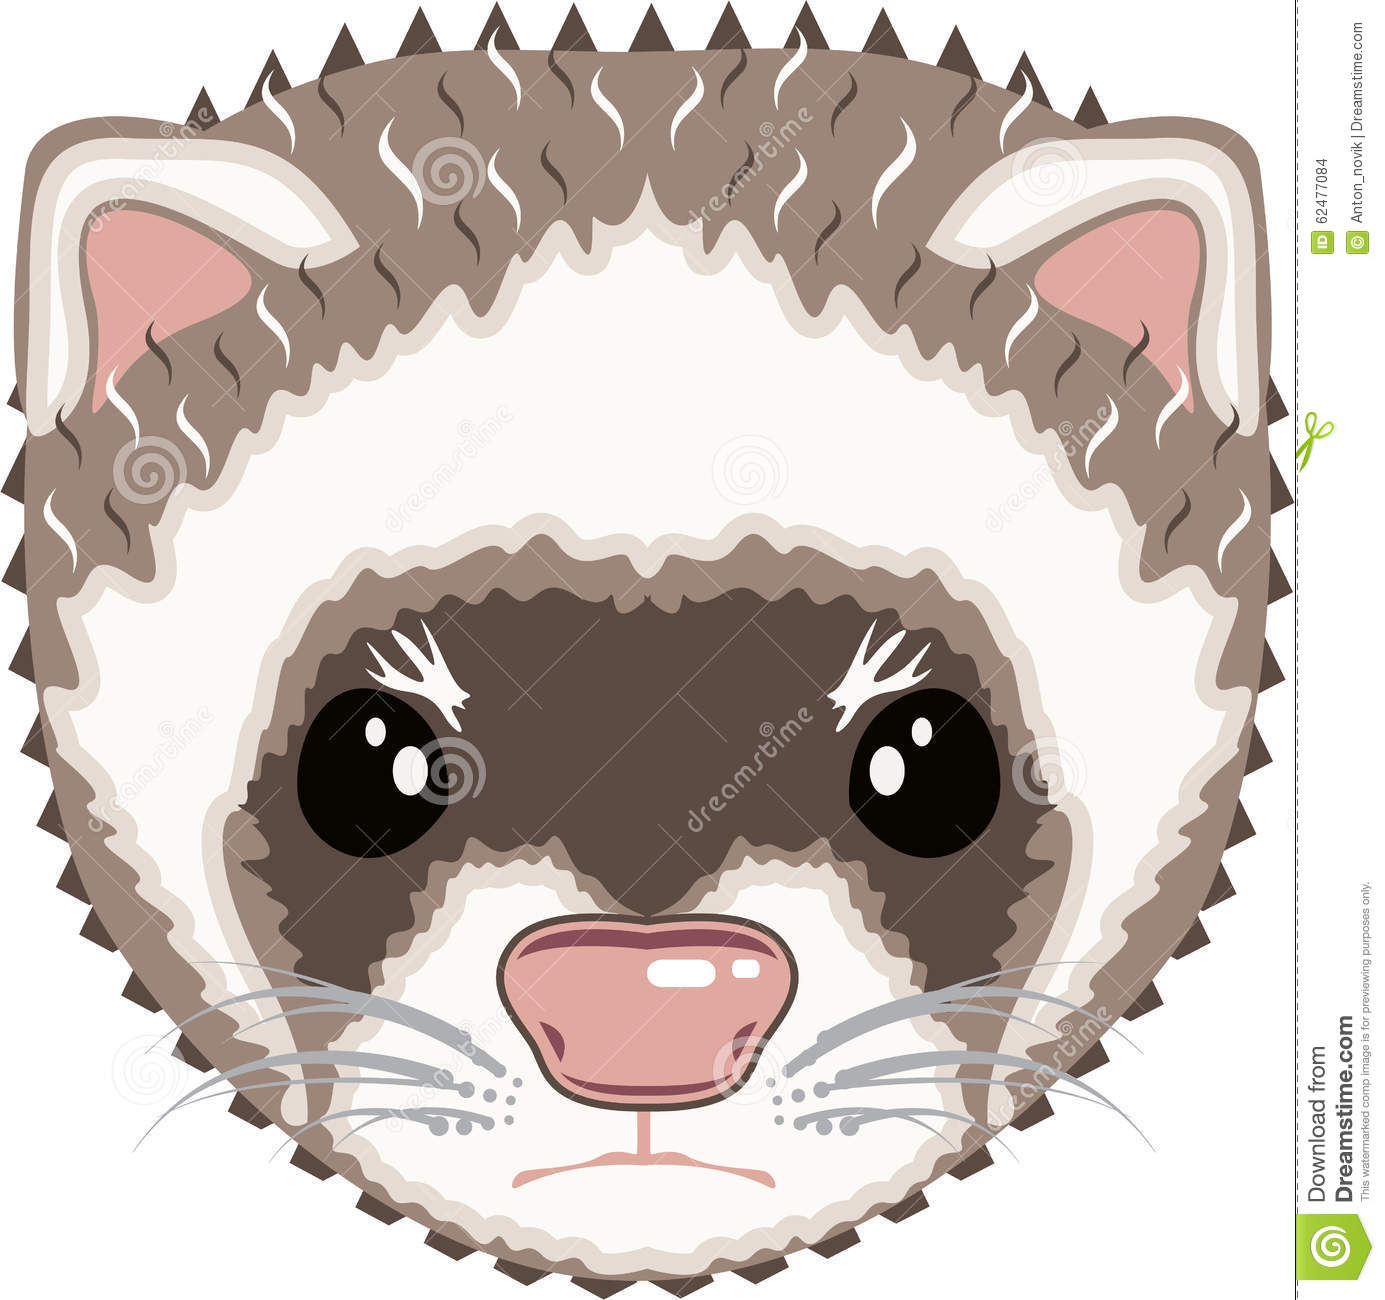 Ferret Clipart   Clipart Panda - Free Clipart Images